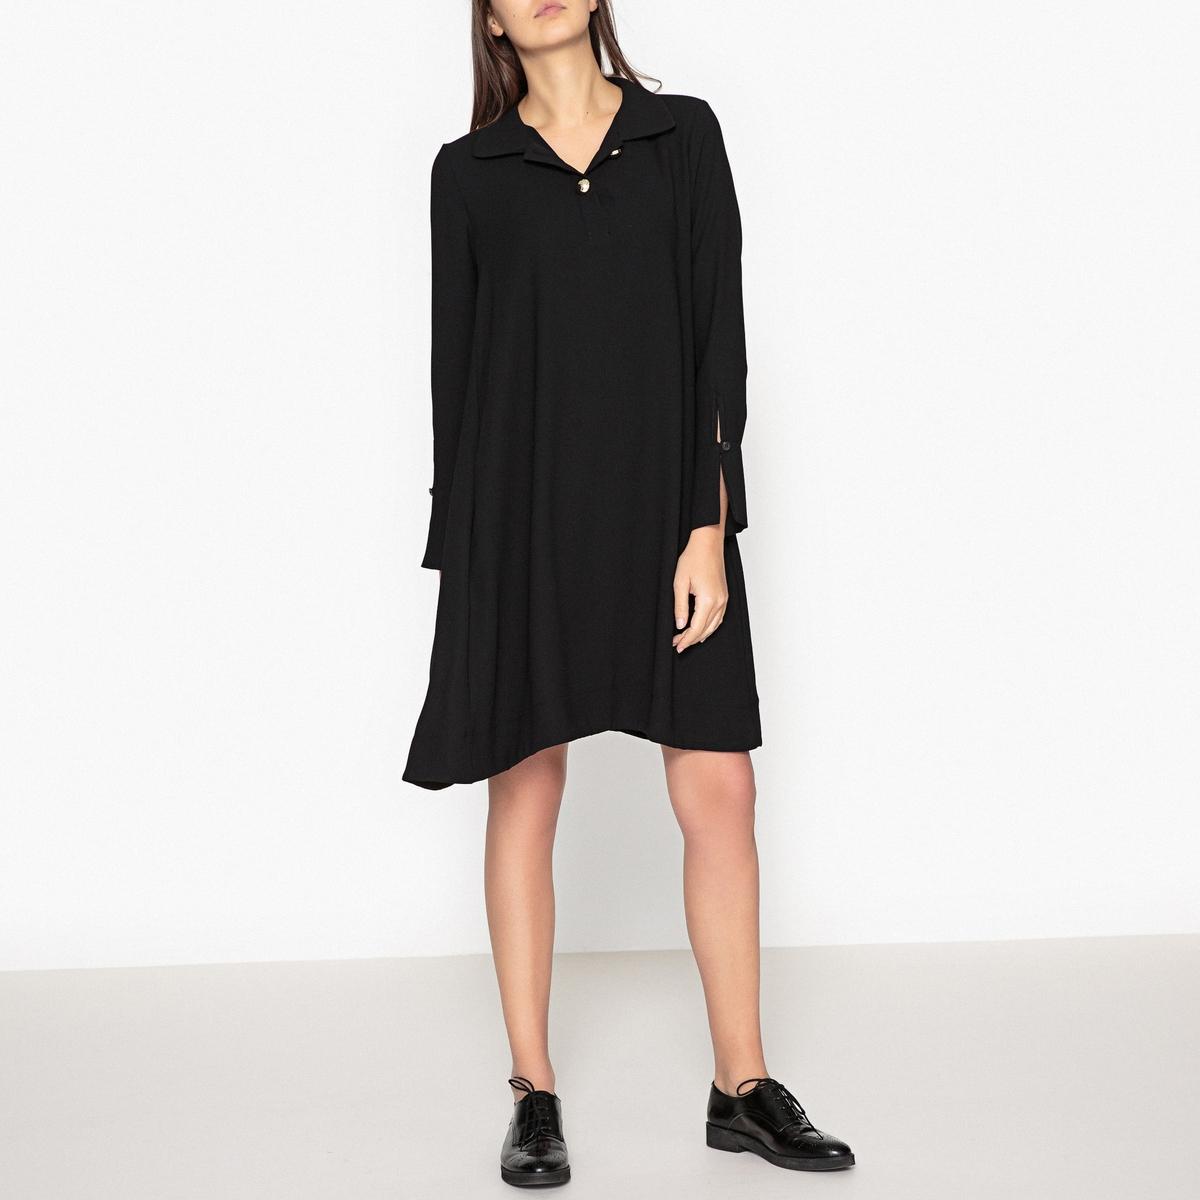 Платье-трапеция CLAUDIE claudie pierlot толстовка claudie pierlot clp104t10e16